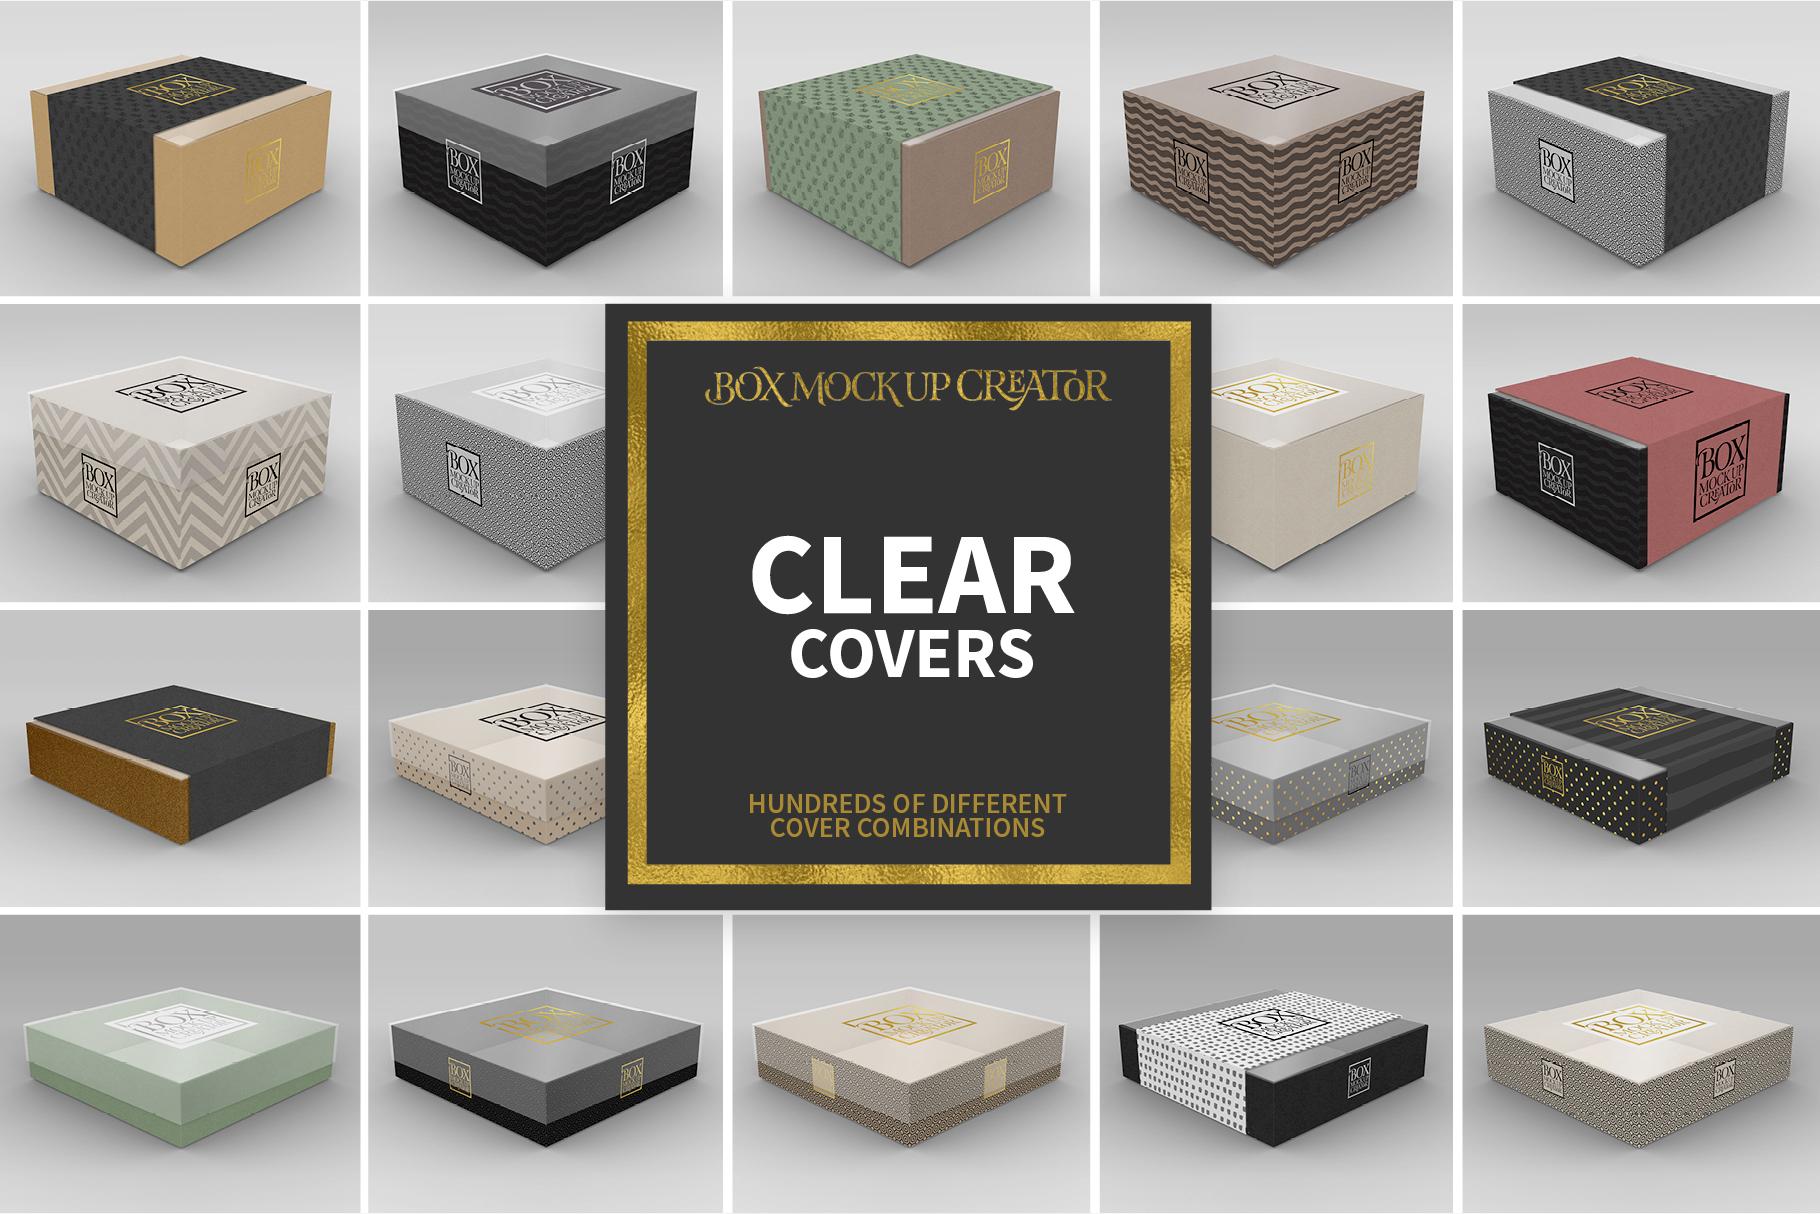 Square Box Packaging Mockup Creator example image 4